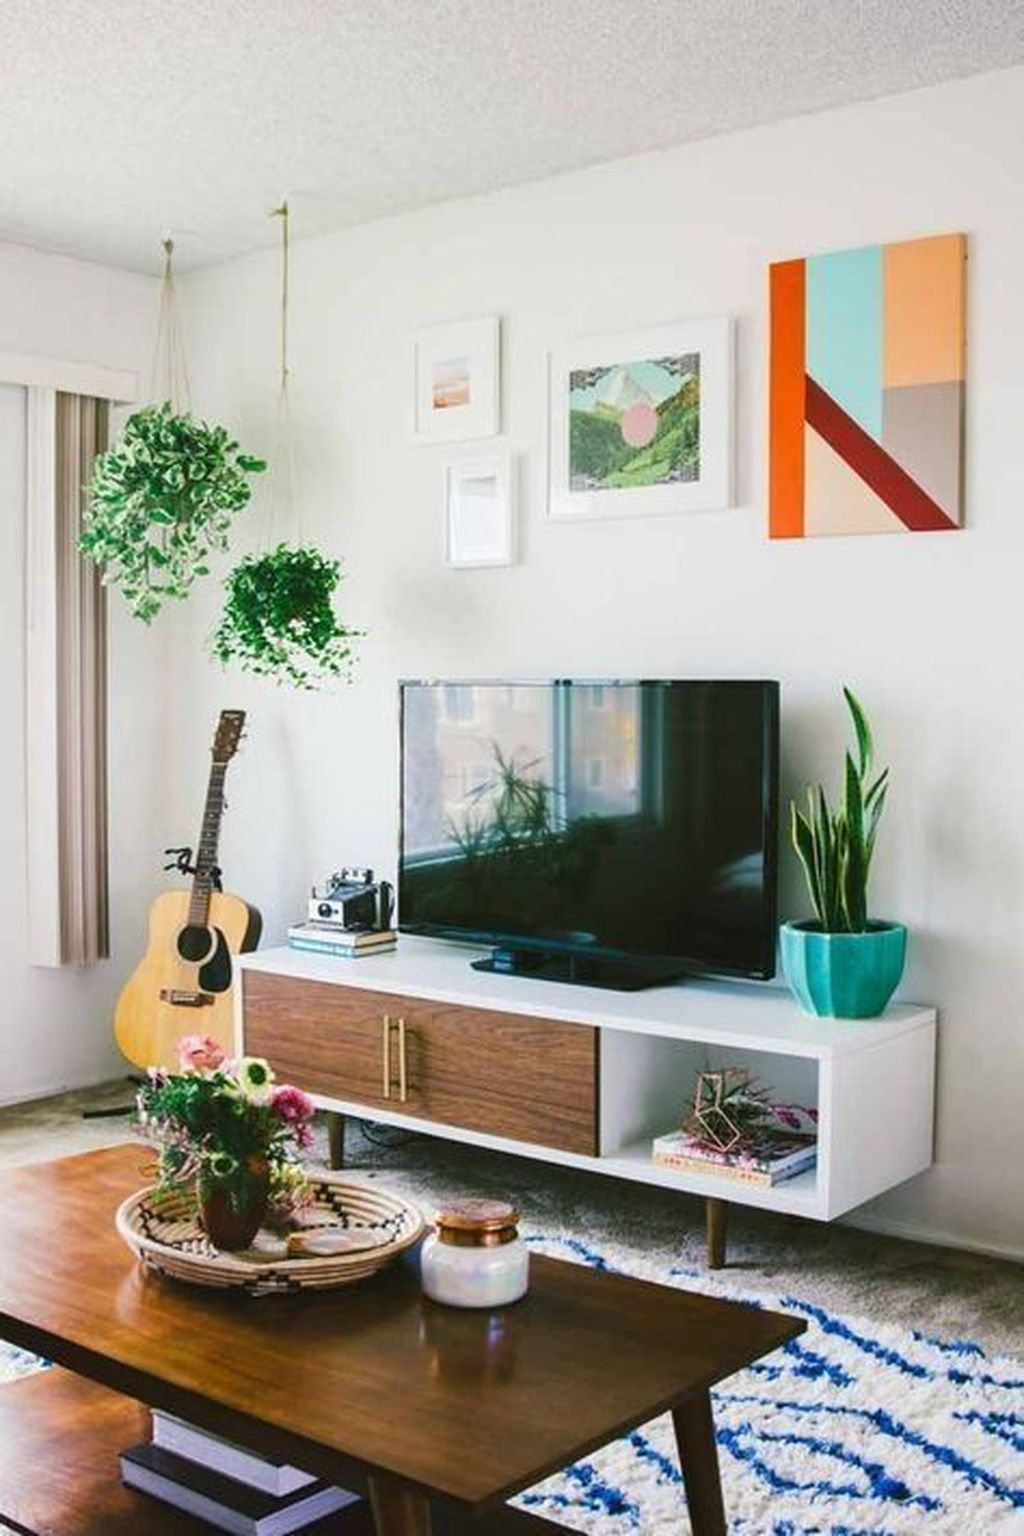 30+ Simple Diy Apartment Decorating Ideas On A Budget ... on Awesome Apartment Budget Apartment Living Room Ideas  id=19127